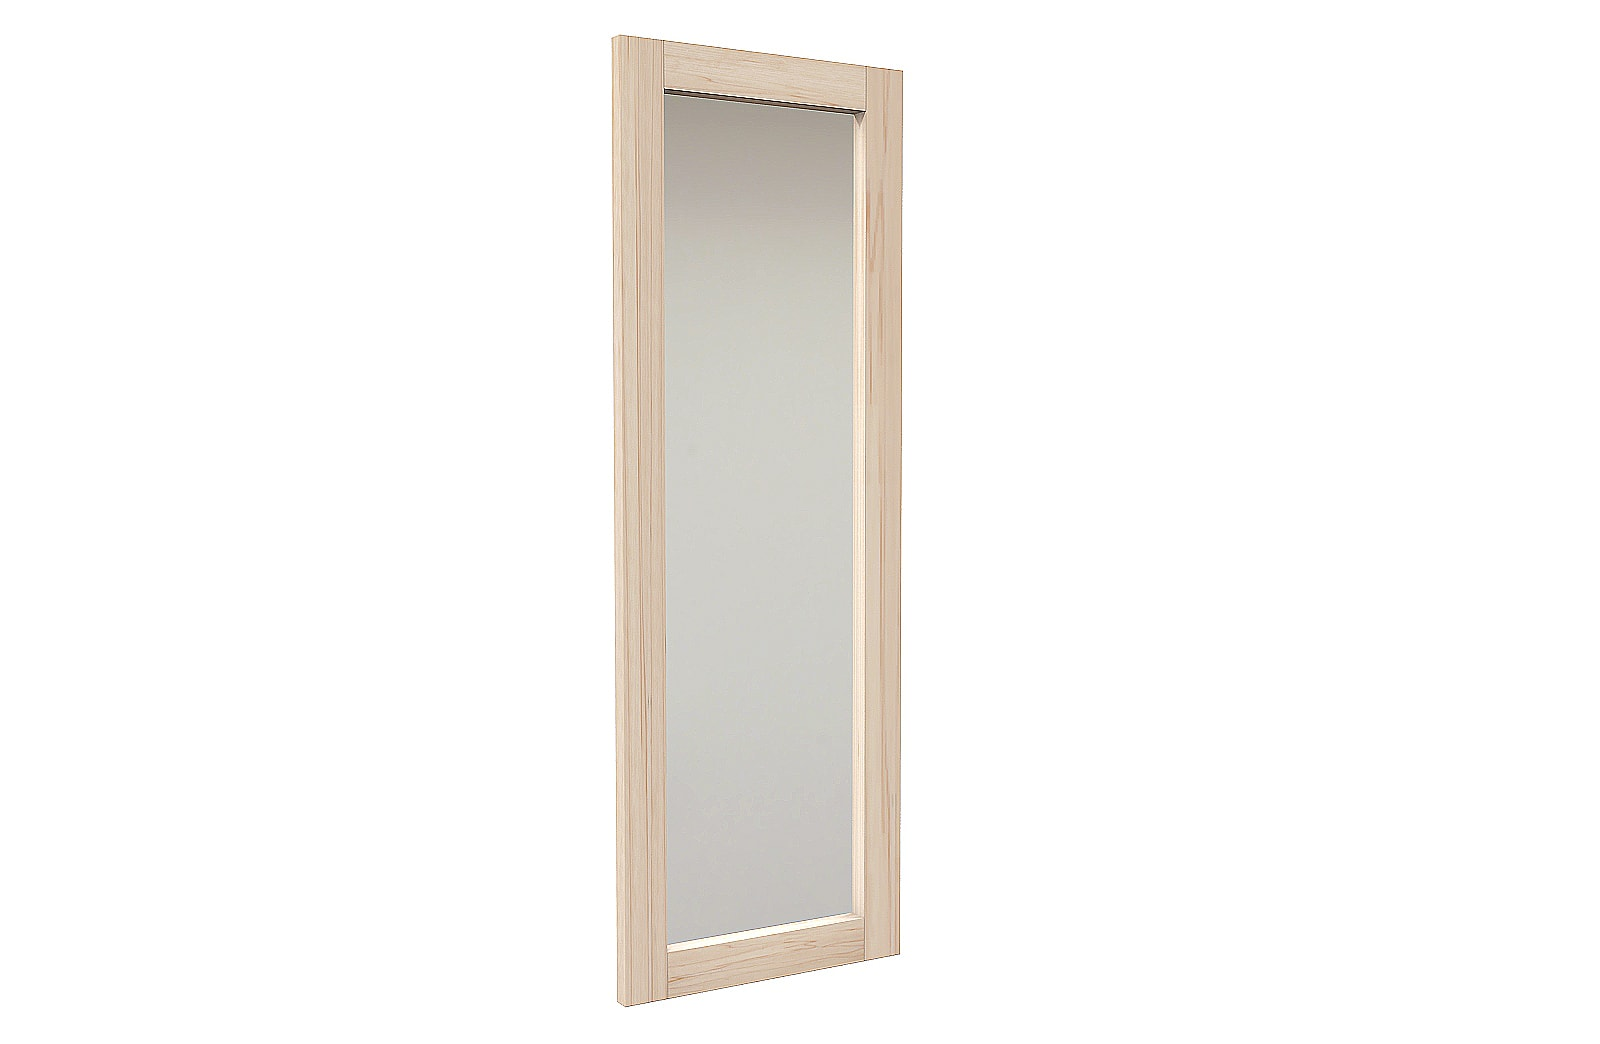 Зеркало в деревянной раме 2000х700 мм